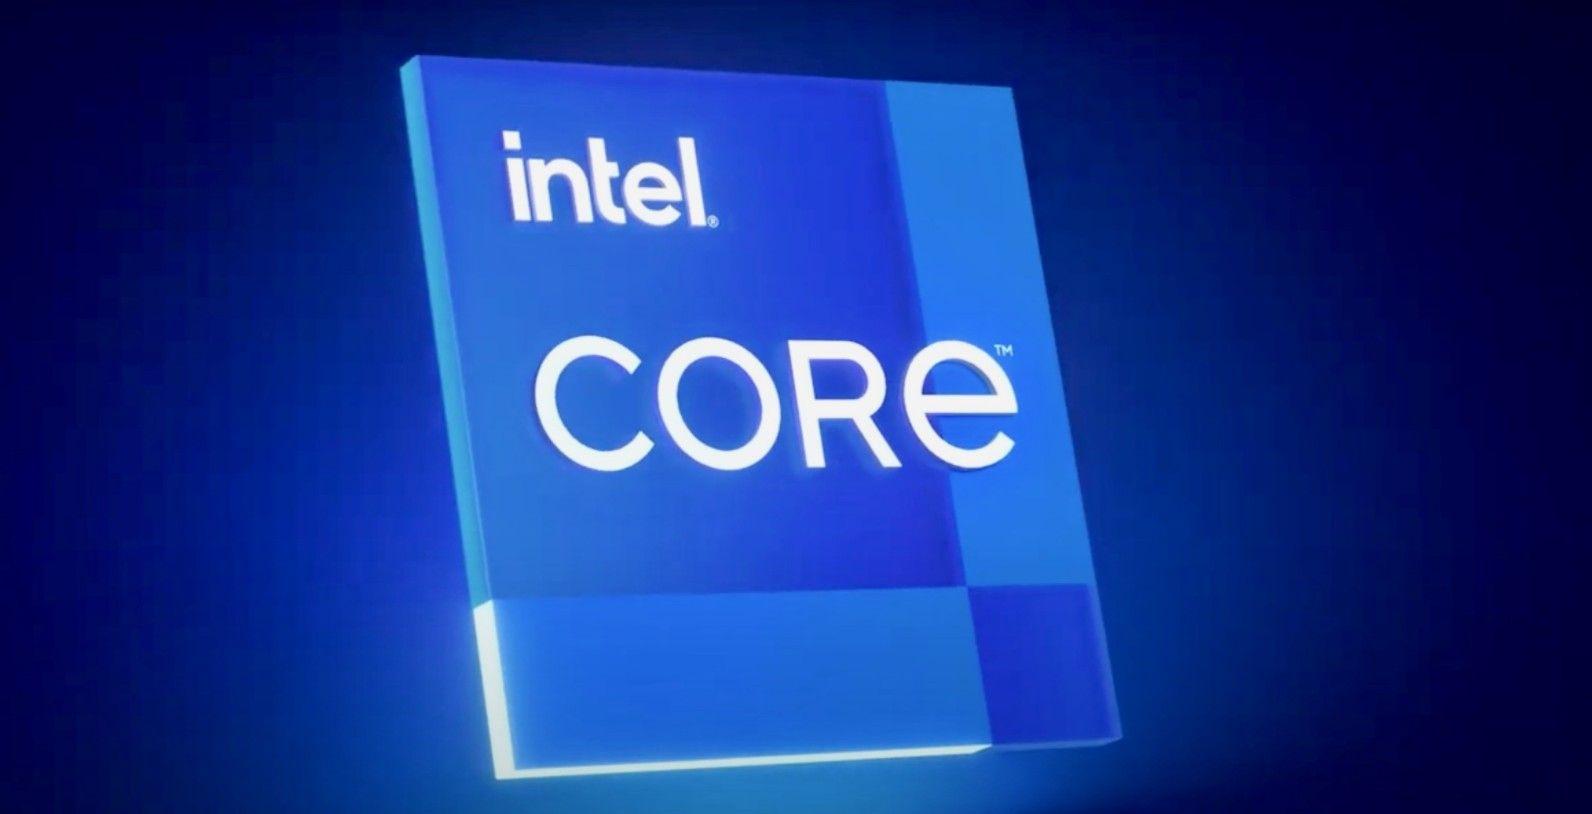 Intel-Core.jpg